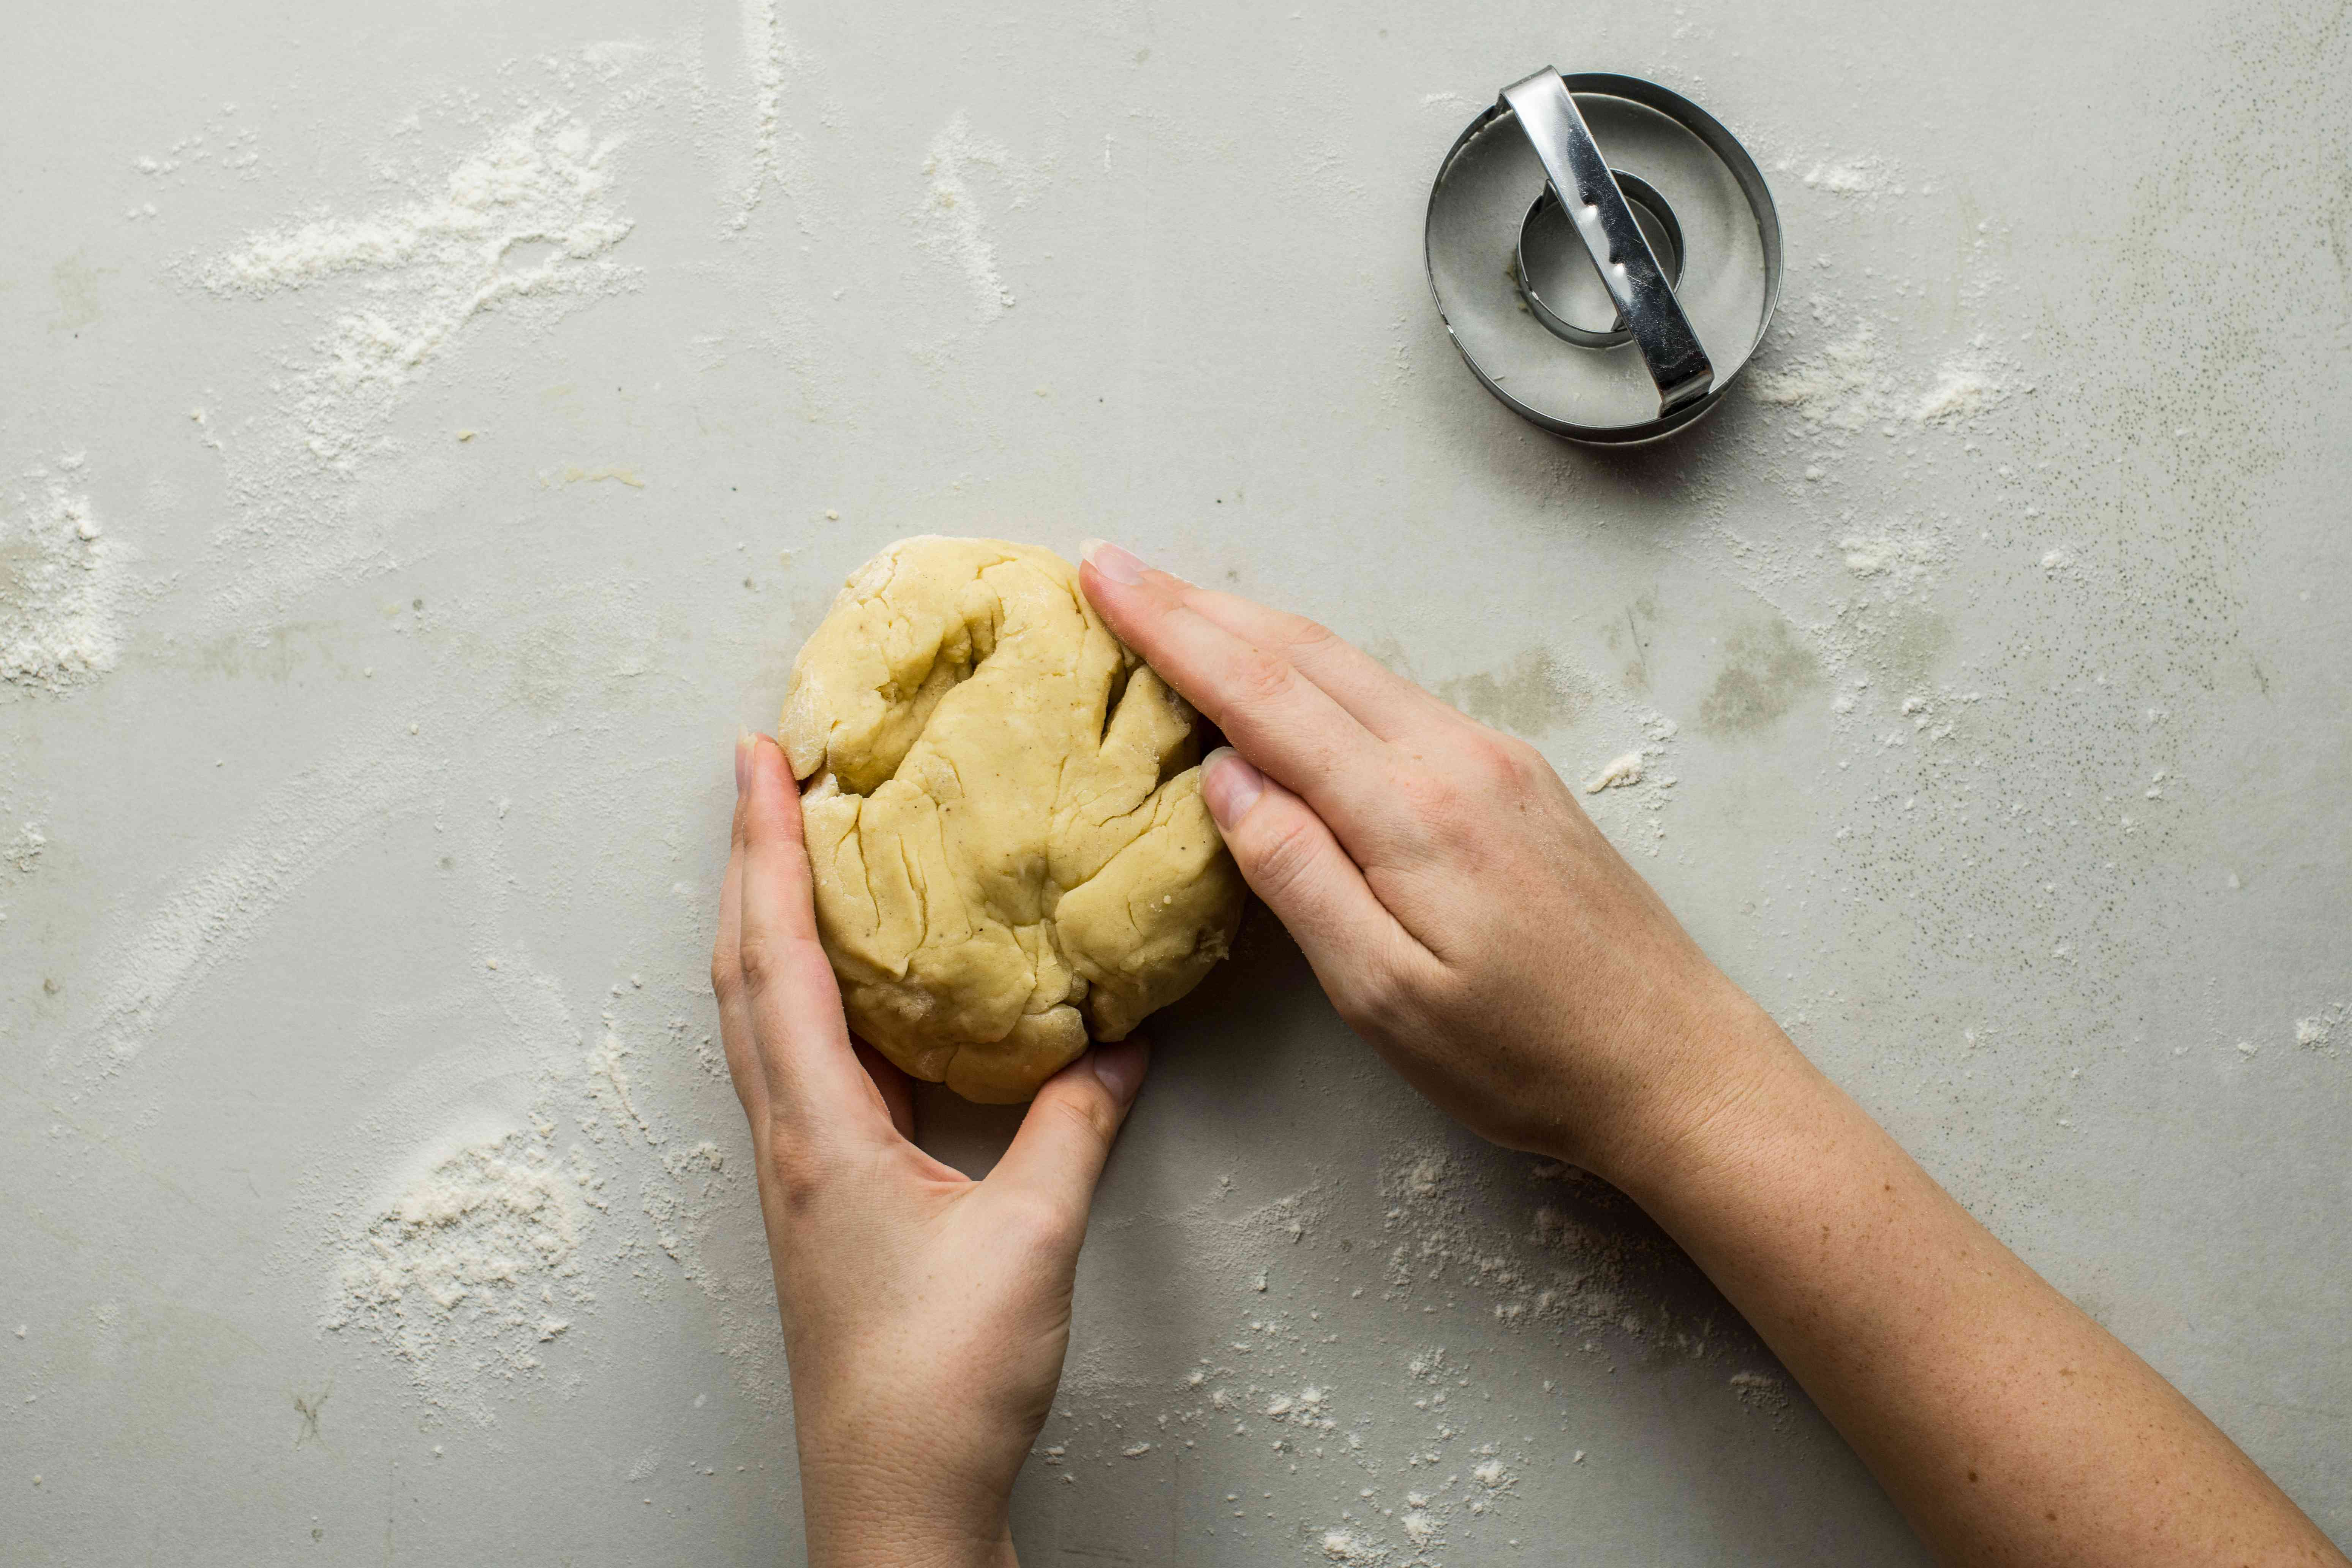 Gently knead dough